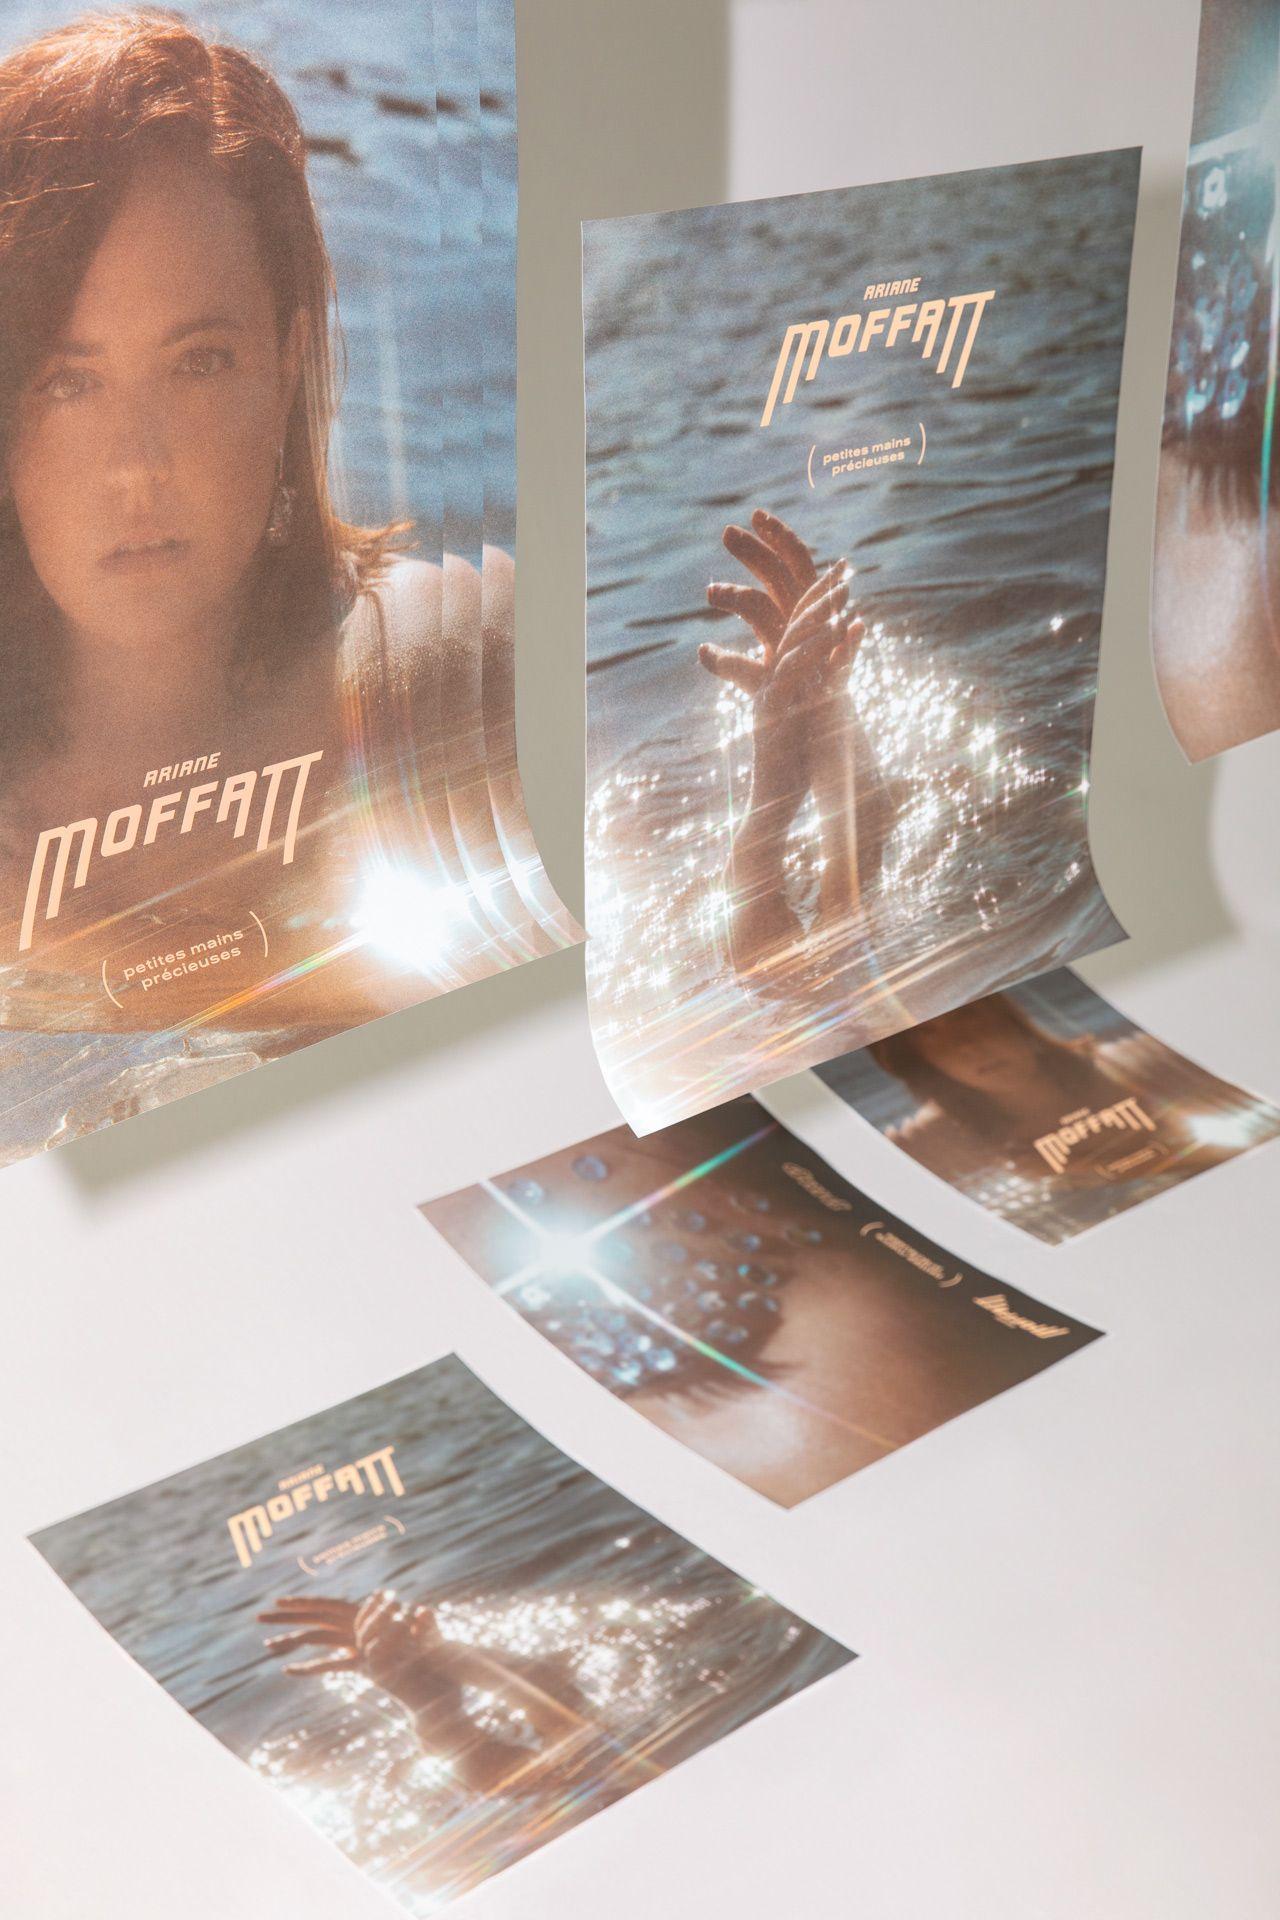 Petites Mains Precieuses album cover of Ariane Moffatt photographed by Kelly Jacob